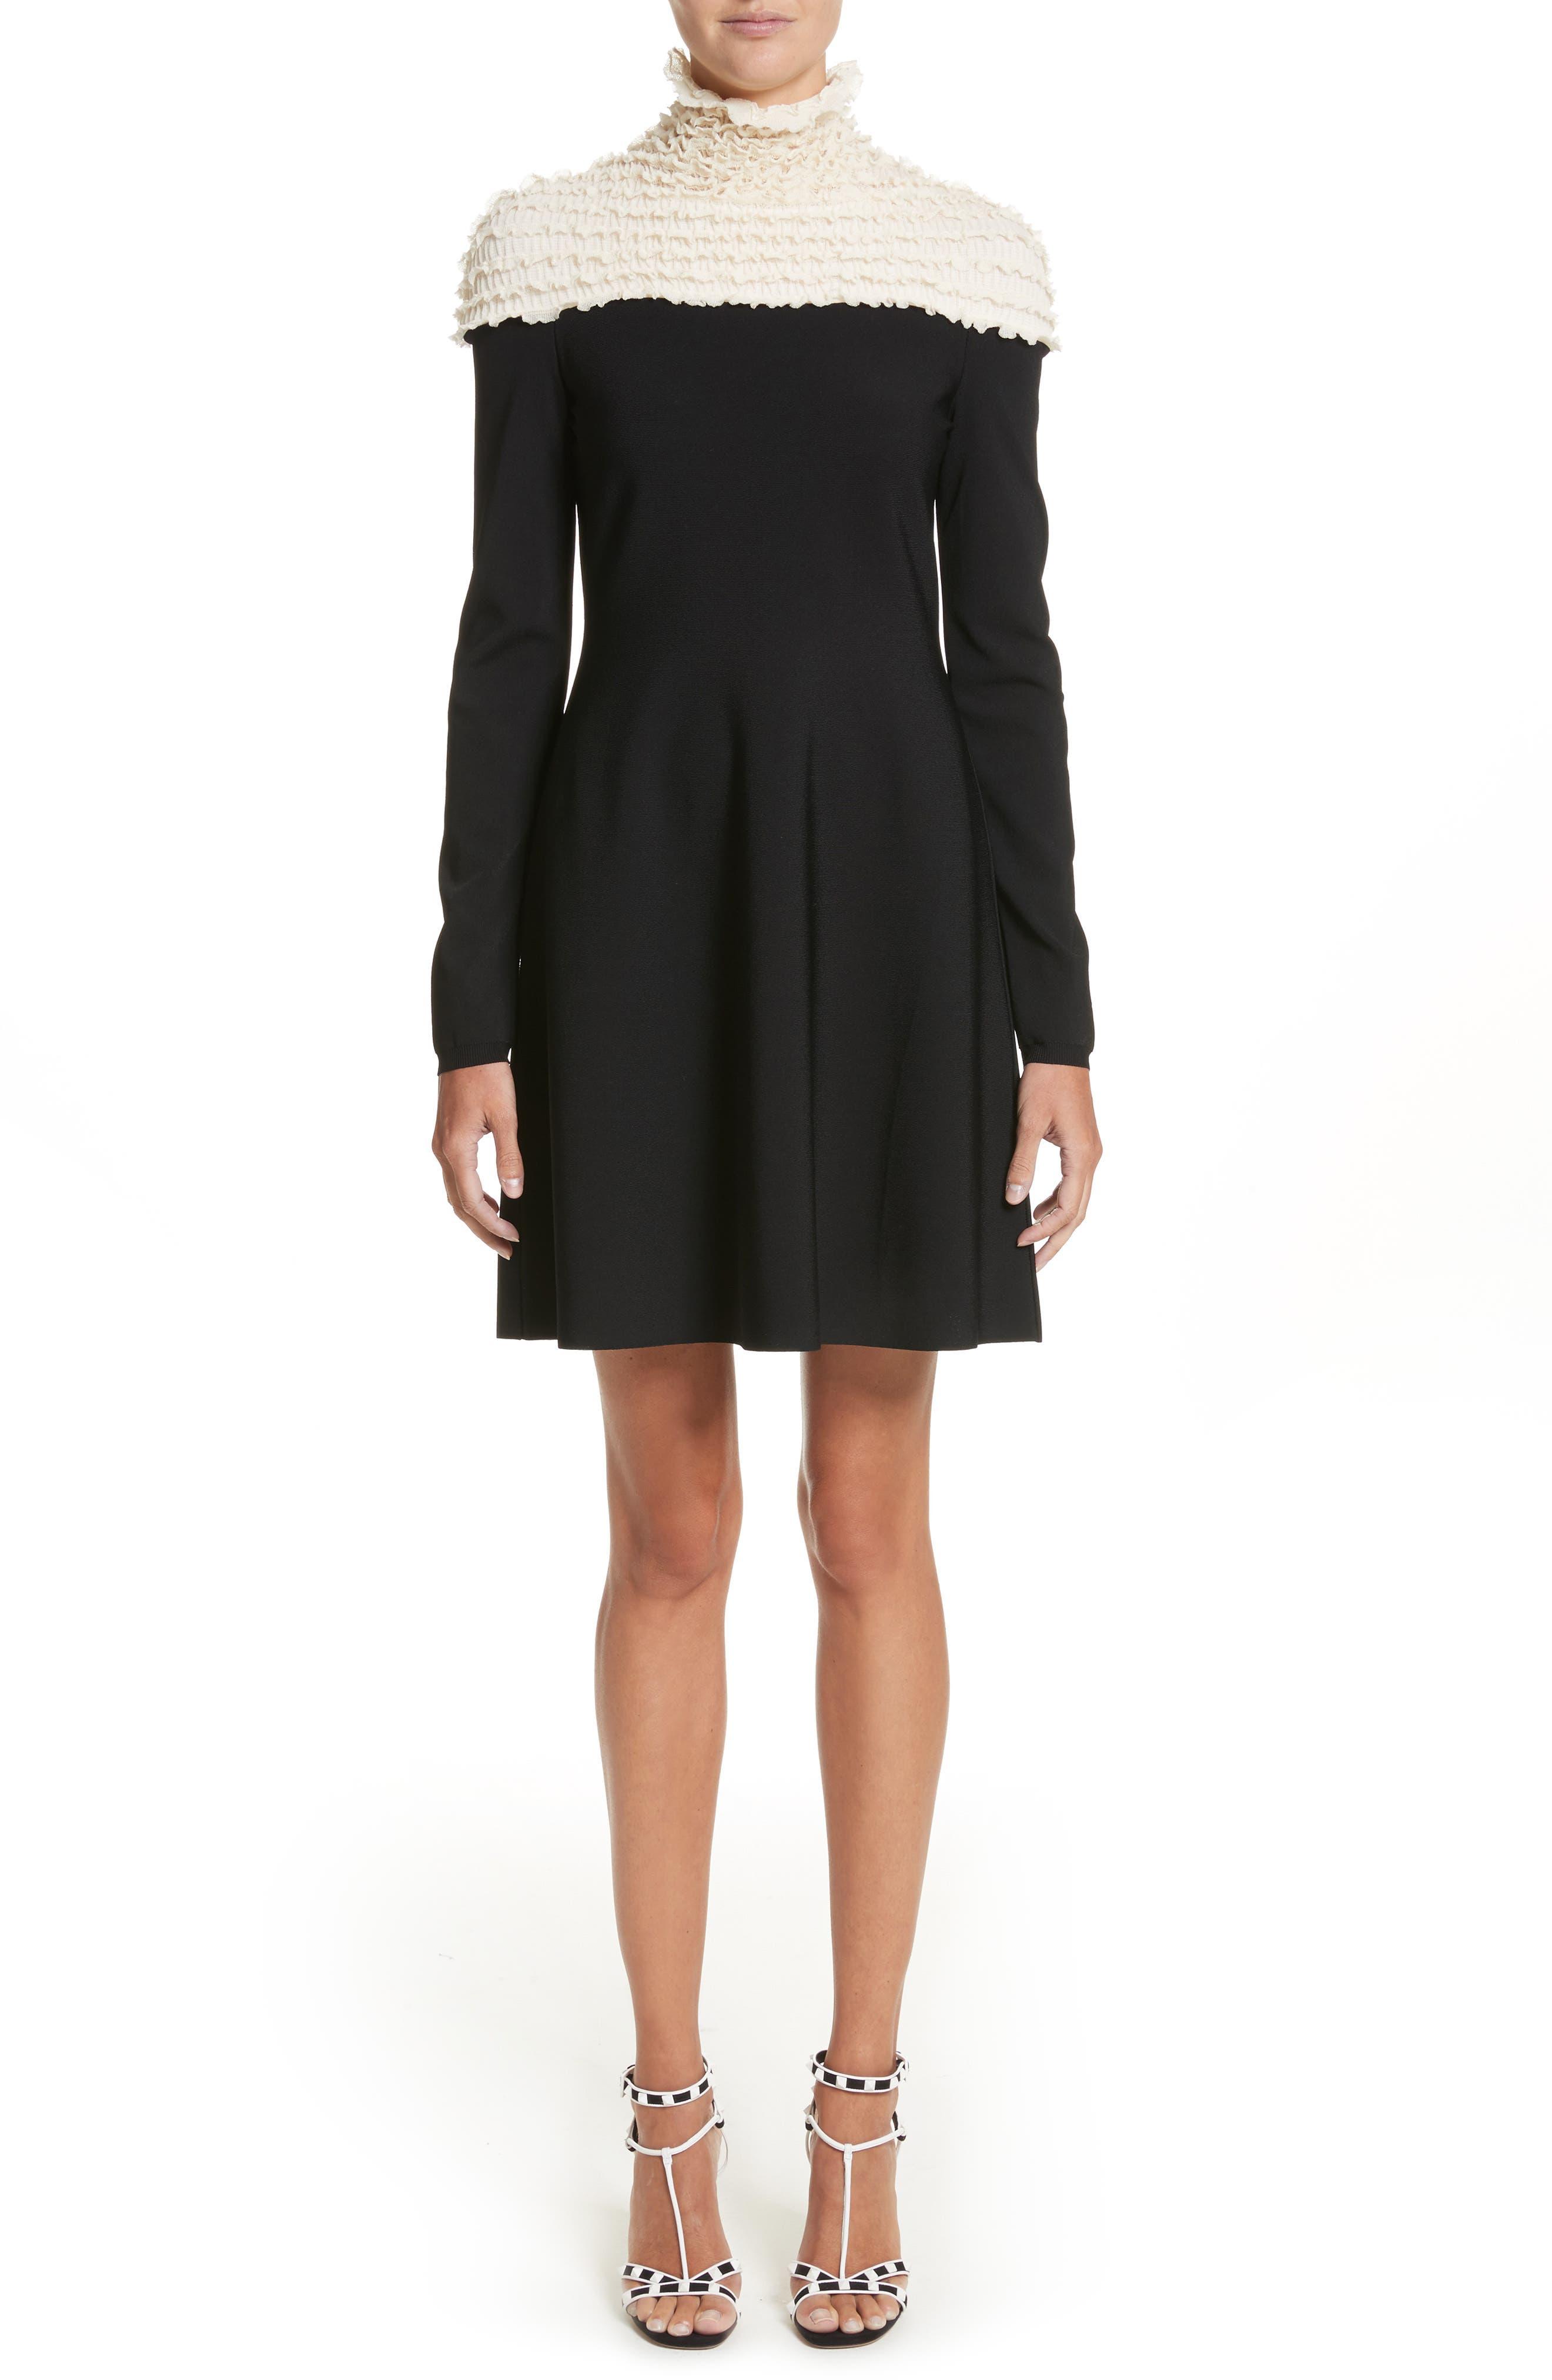 Valentino Ruffle Neckline Knit Dress